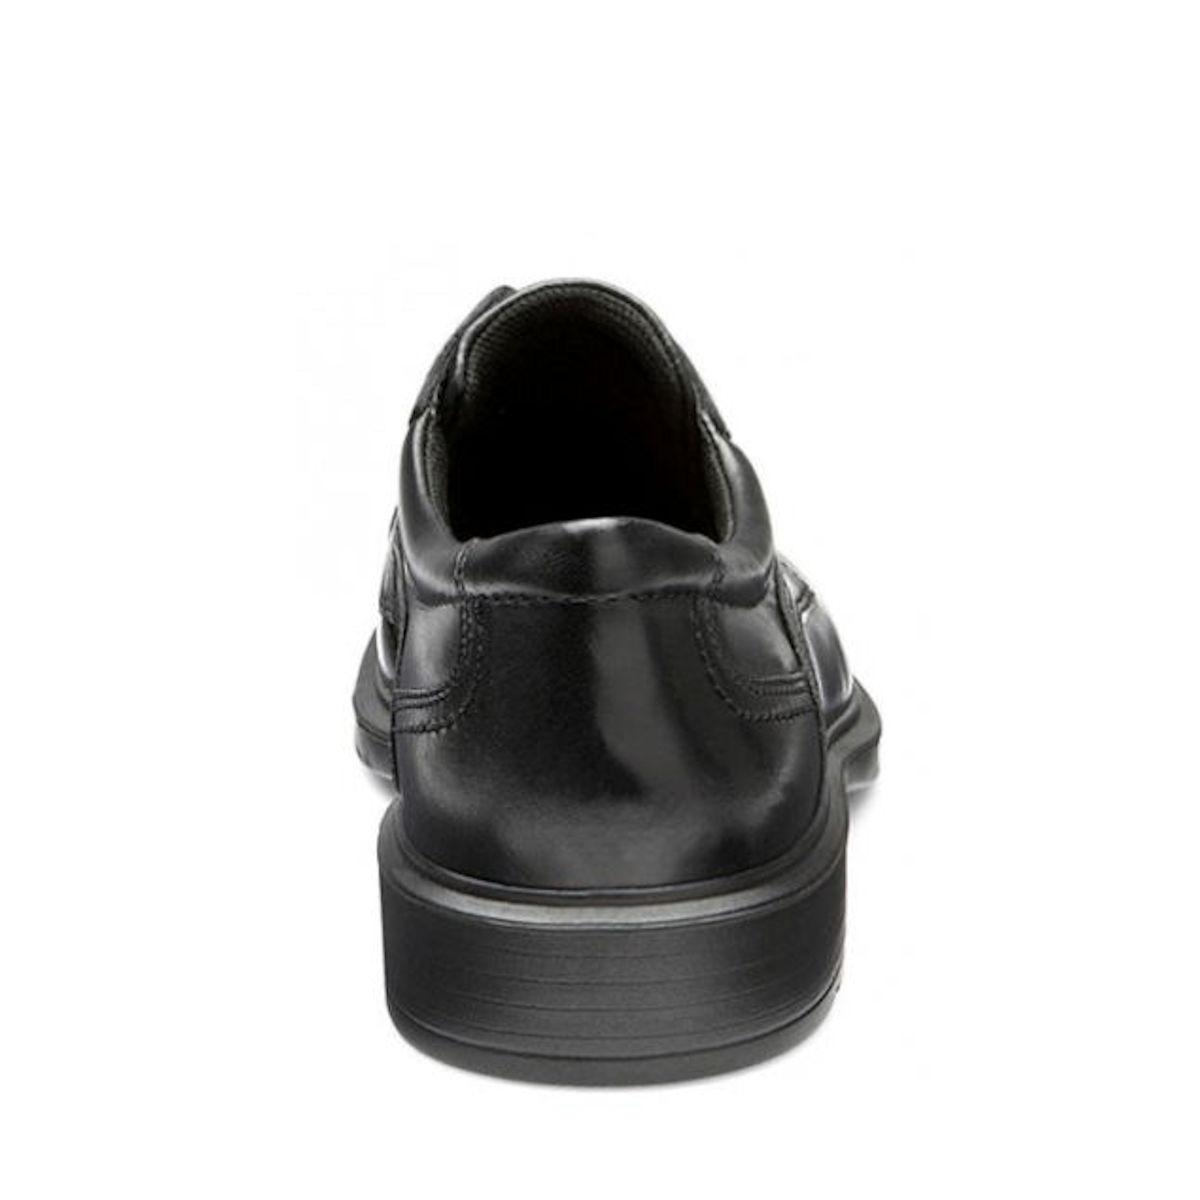 ECCO Helsinki 5014400101 - Mens Lace Up Black Formal Shoe